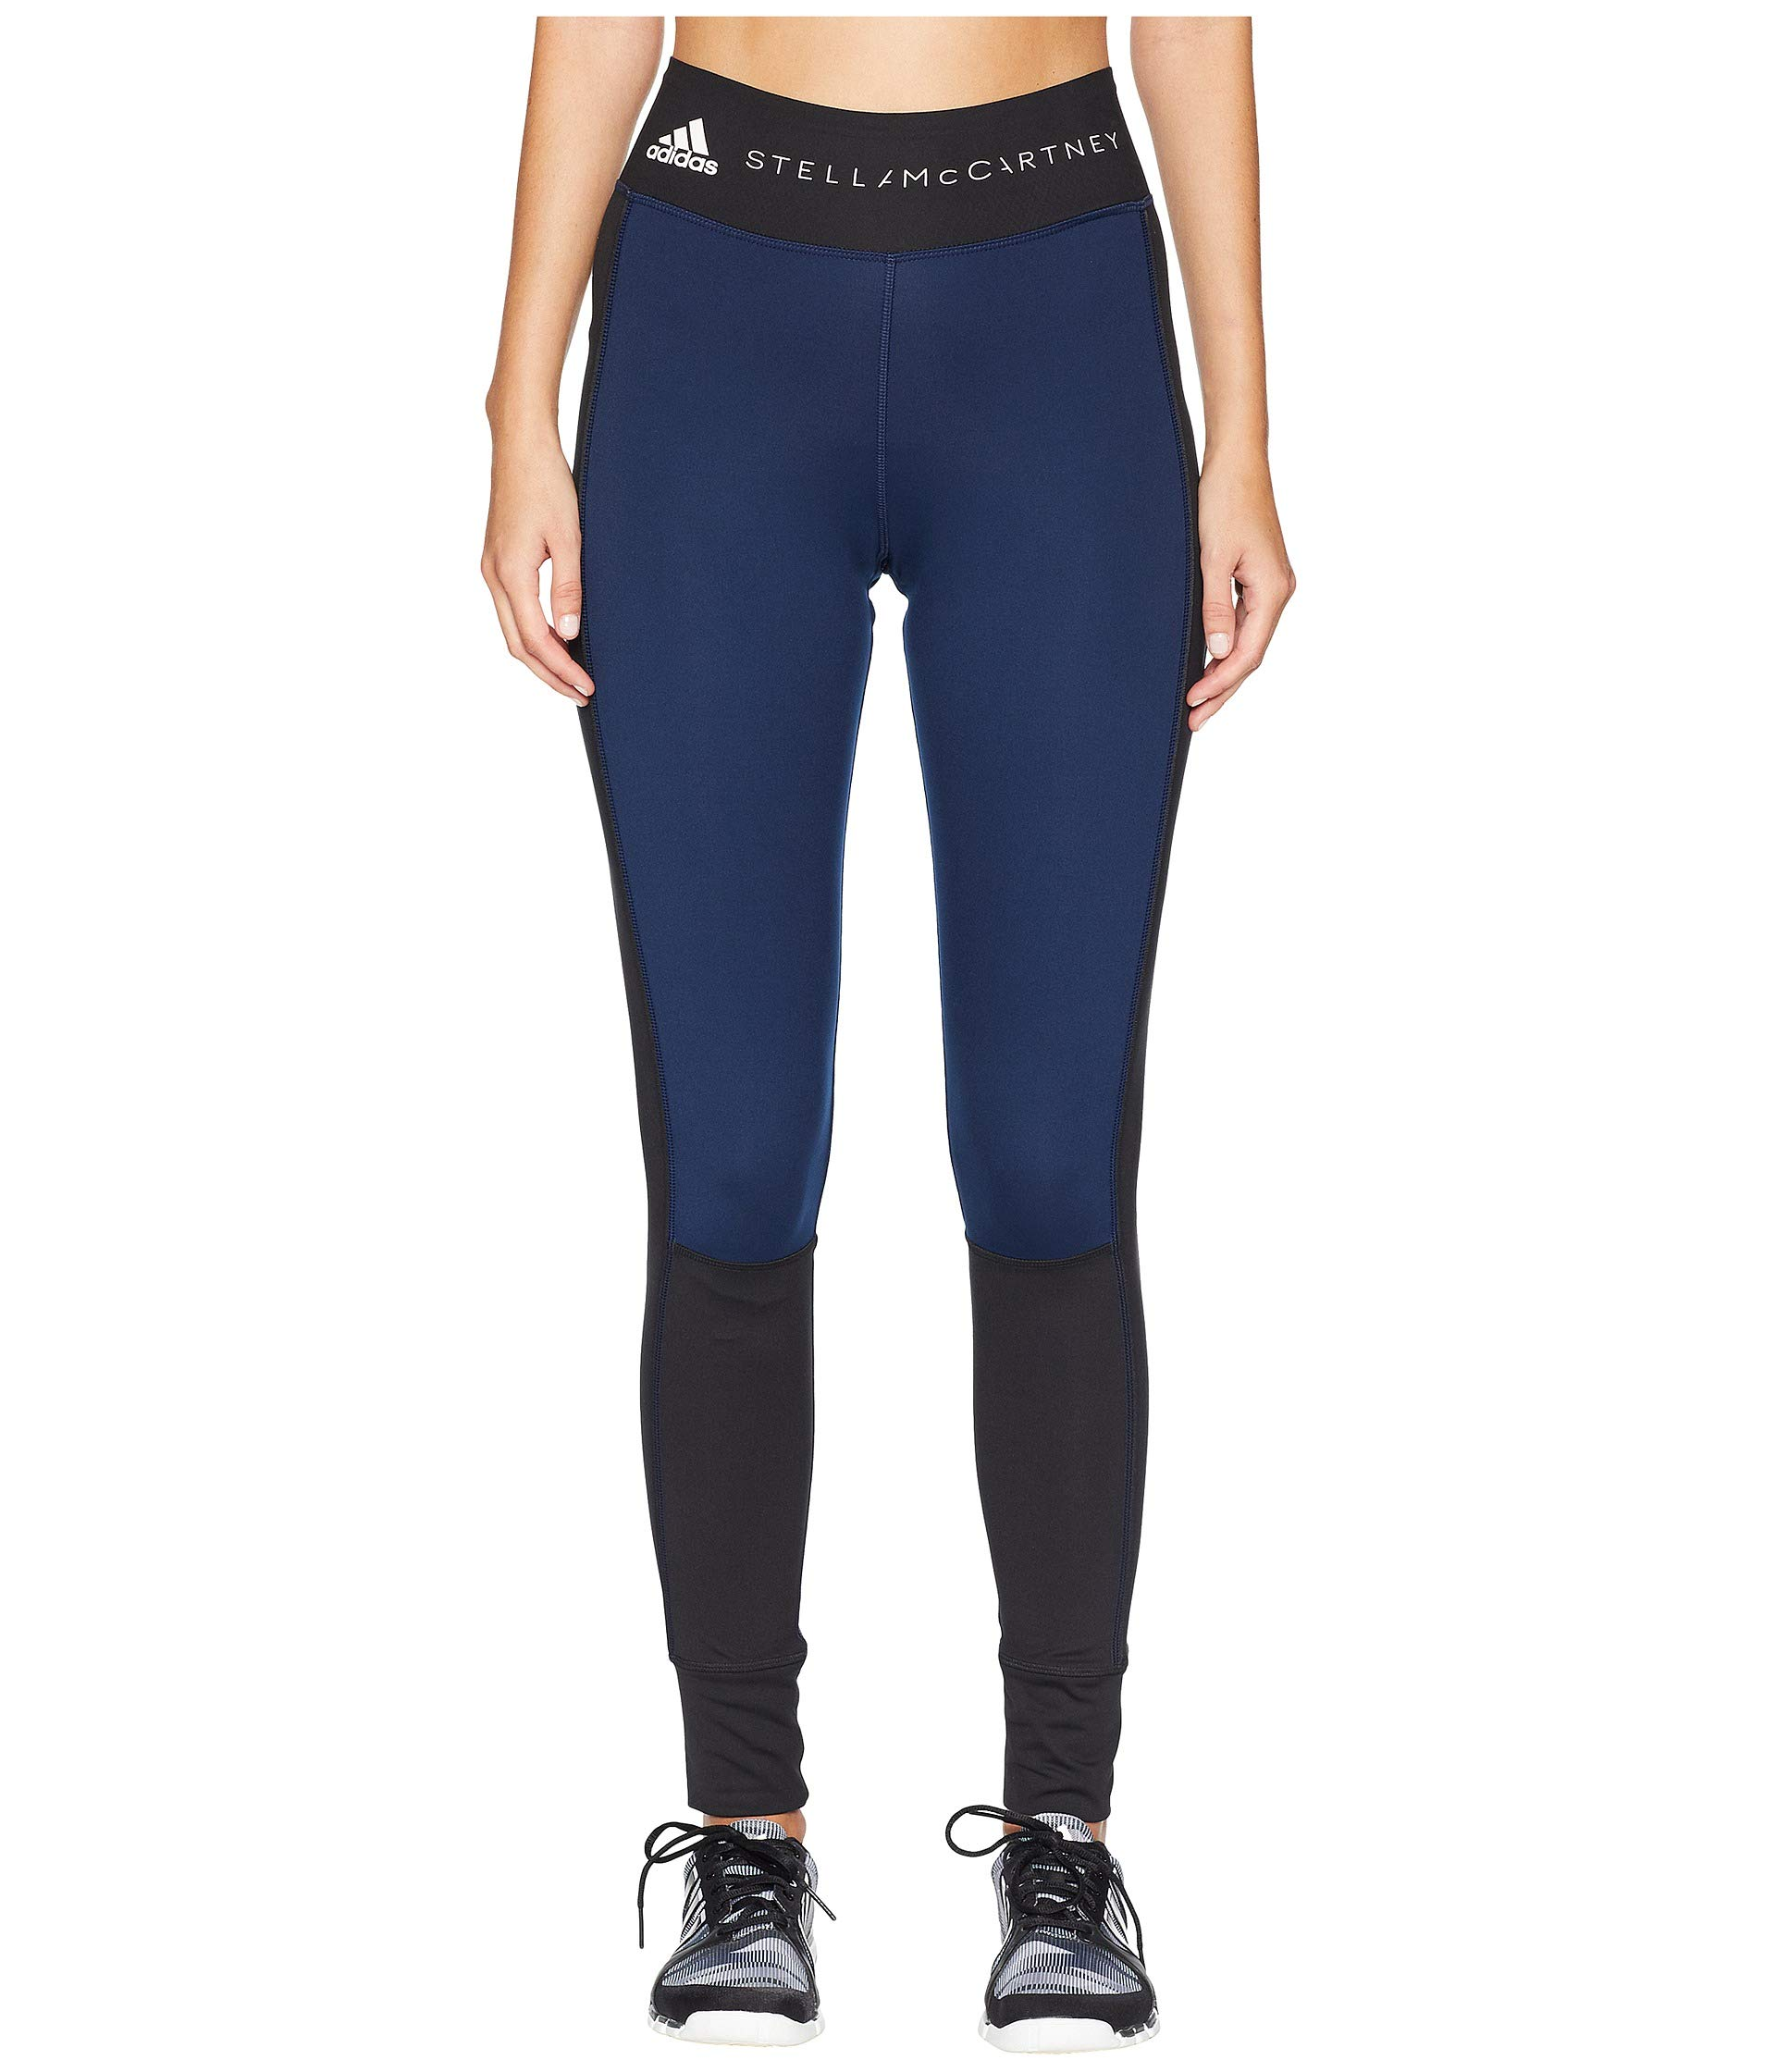 Yoga By Black Indigo Tights Comfort Adidas Stella night Mccartney Cz1784 OwTqdtt0R